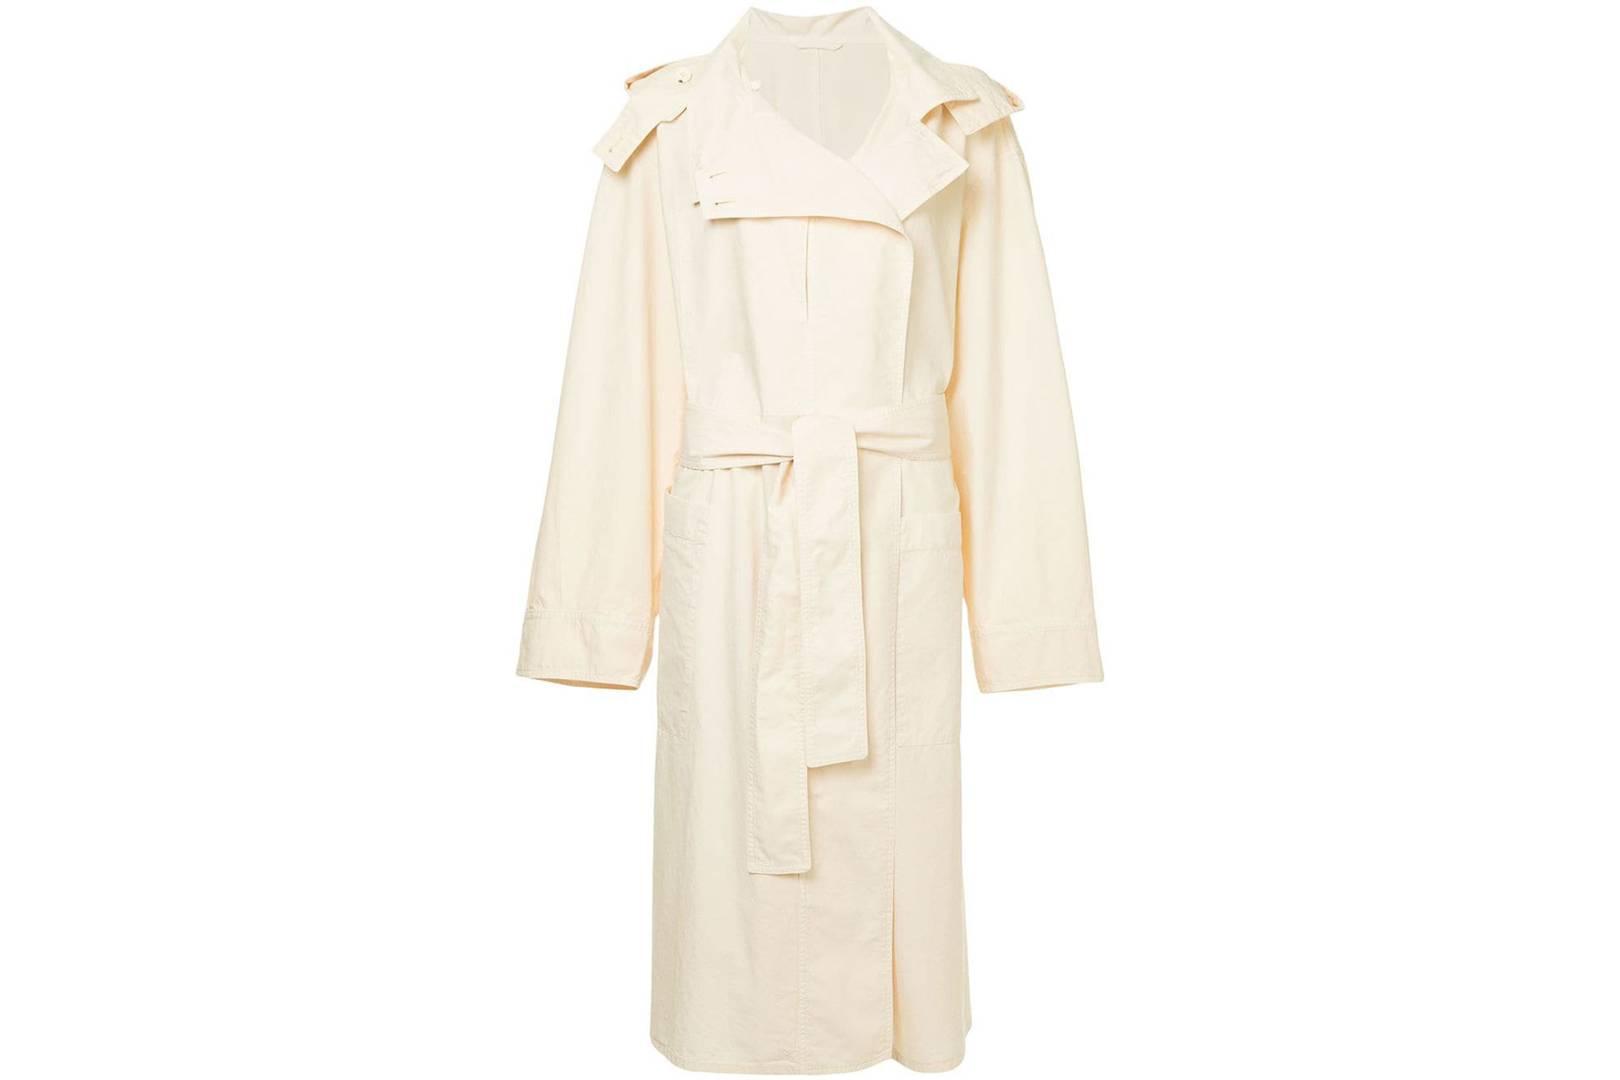 d3a7fd457 Best Winter Coats 2018 | The Women's Winter Coats To Buy Now ...